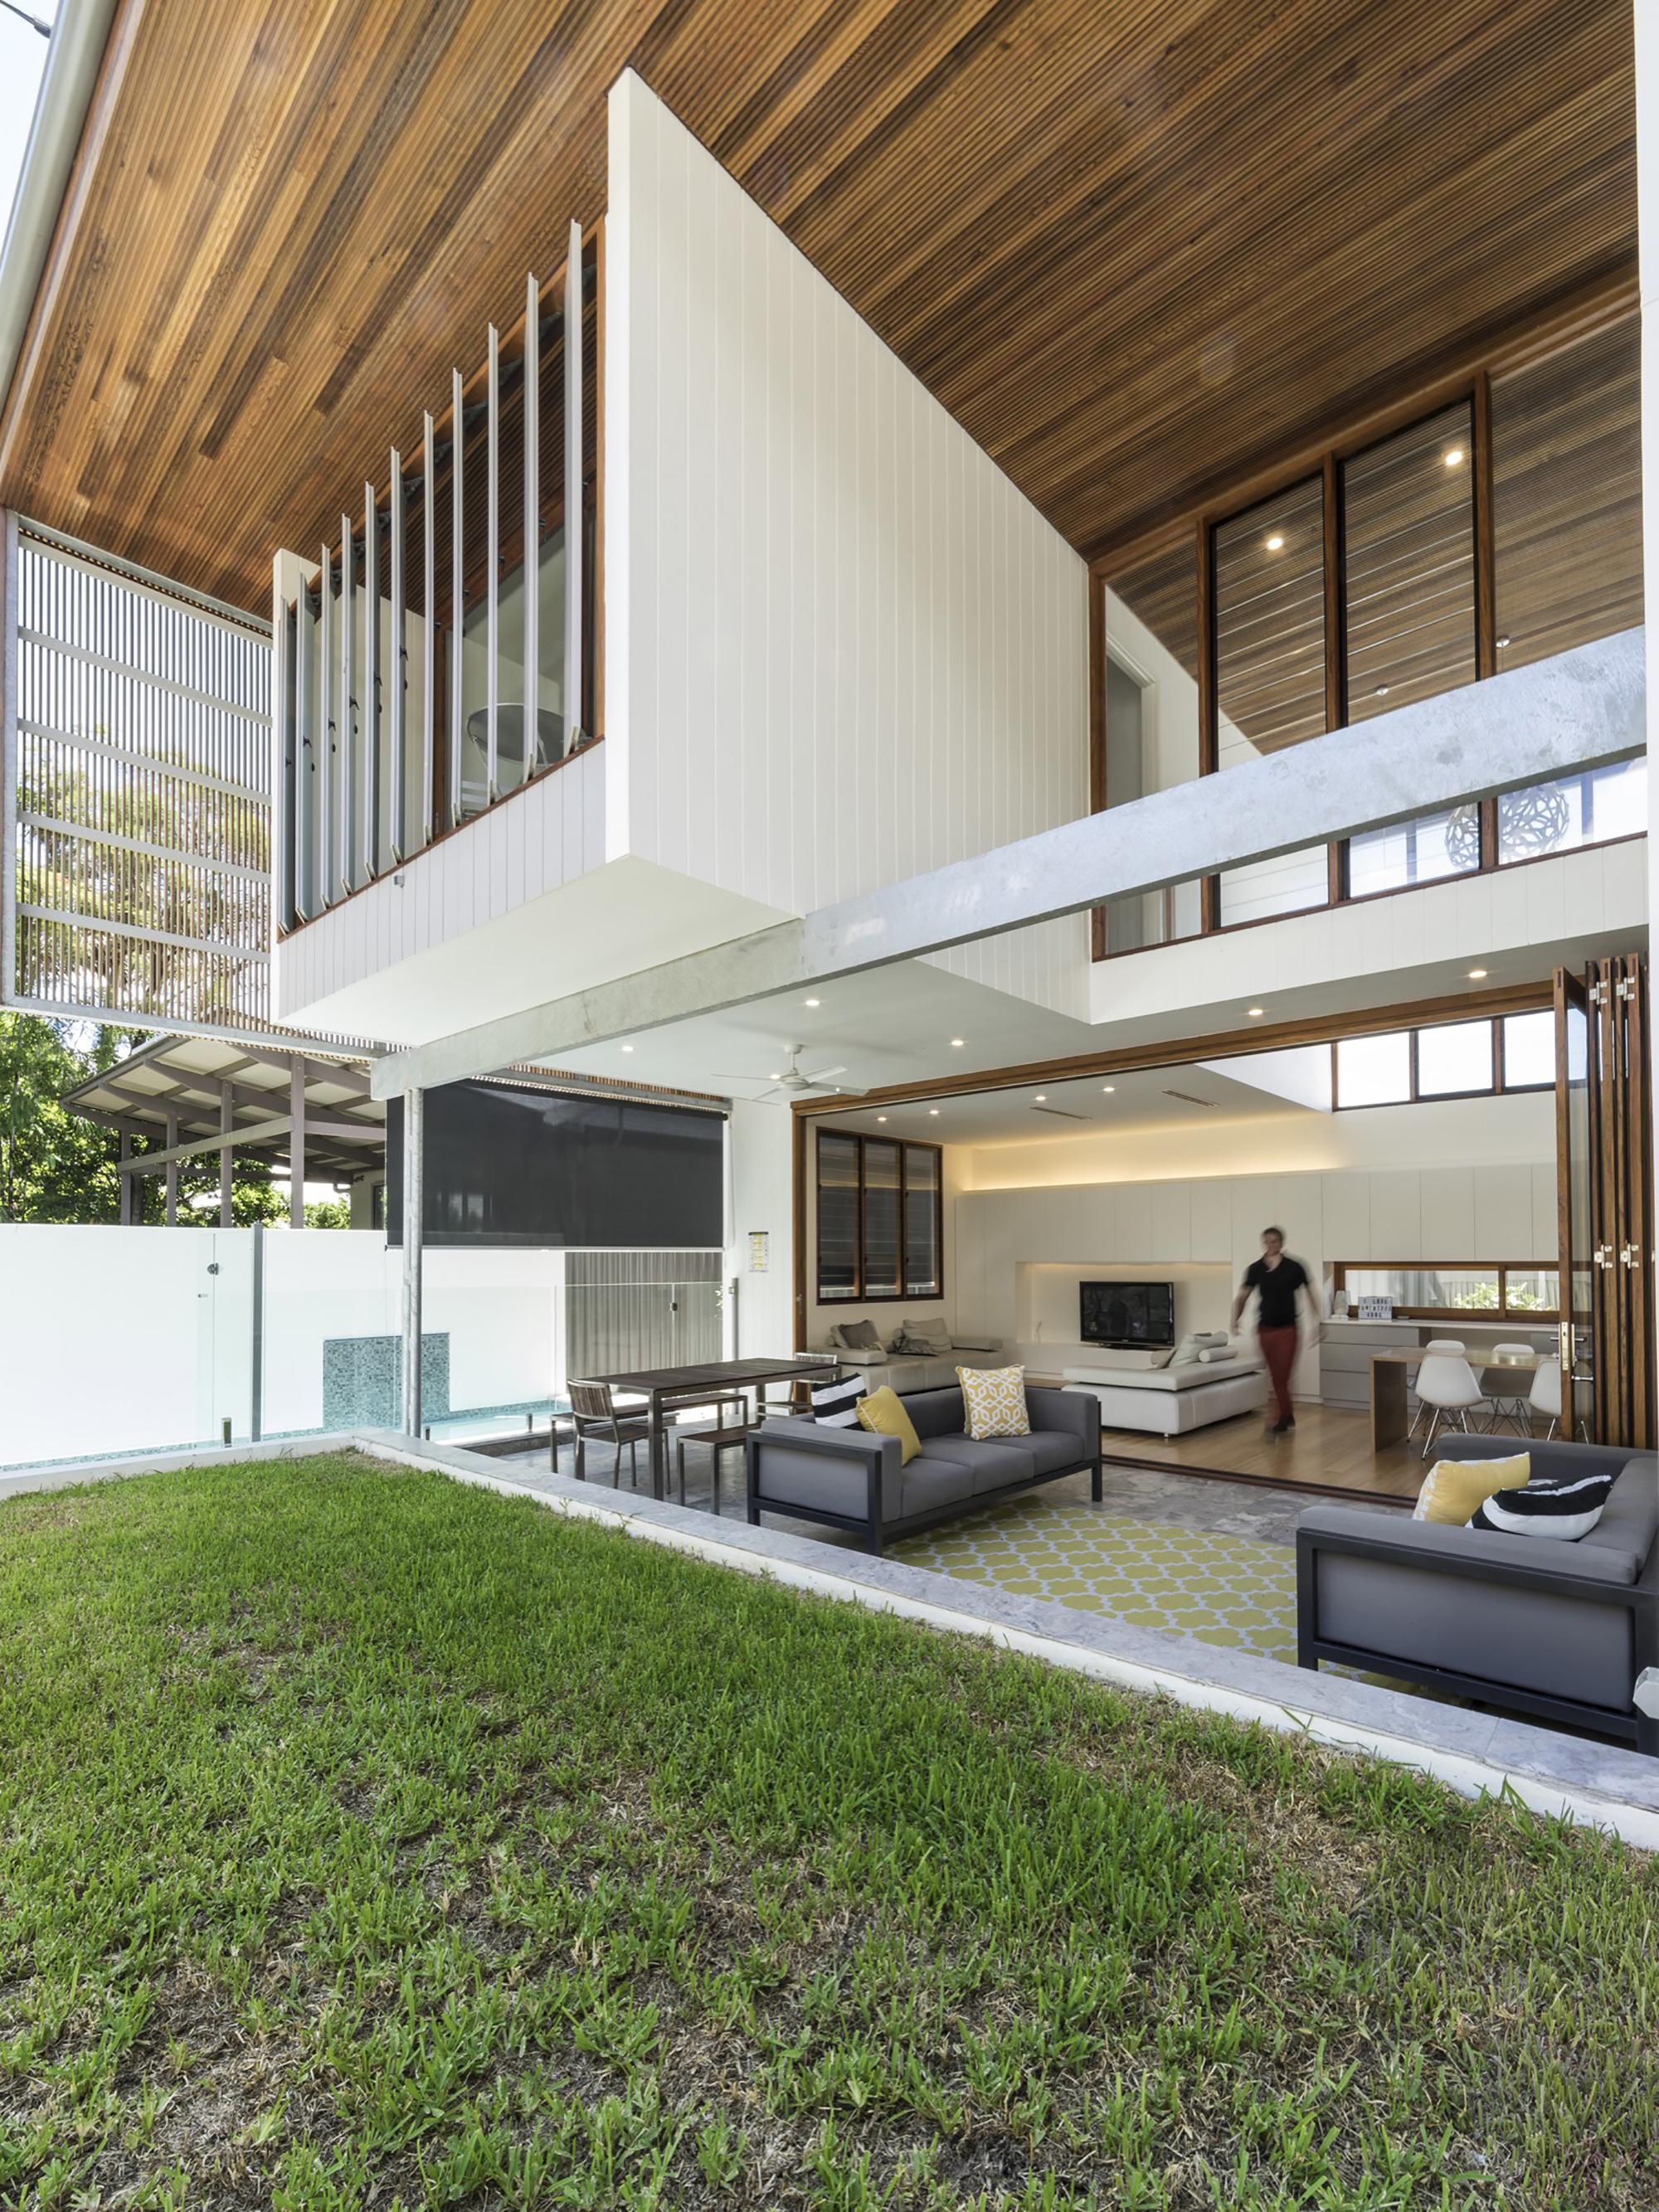 Nice Backyard Architect Part - 7: Backyard House / Joe Adsett Architects, Courtesy Of Joe Adsett Architects